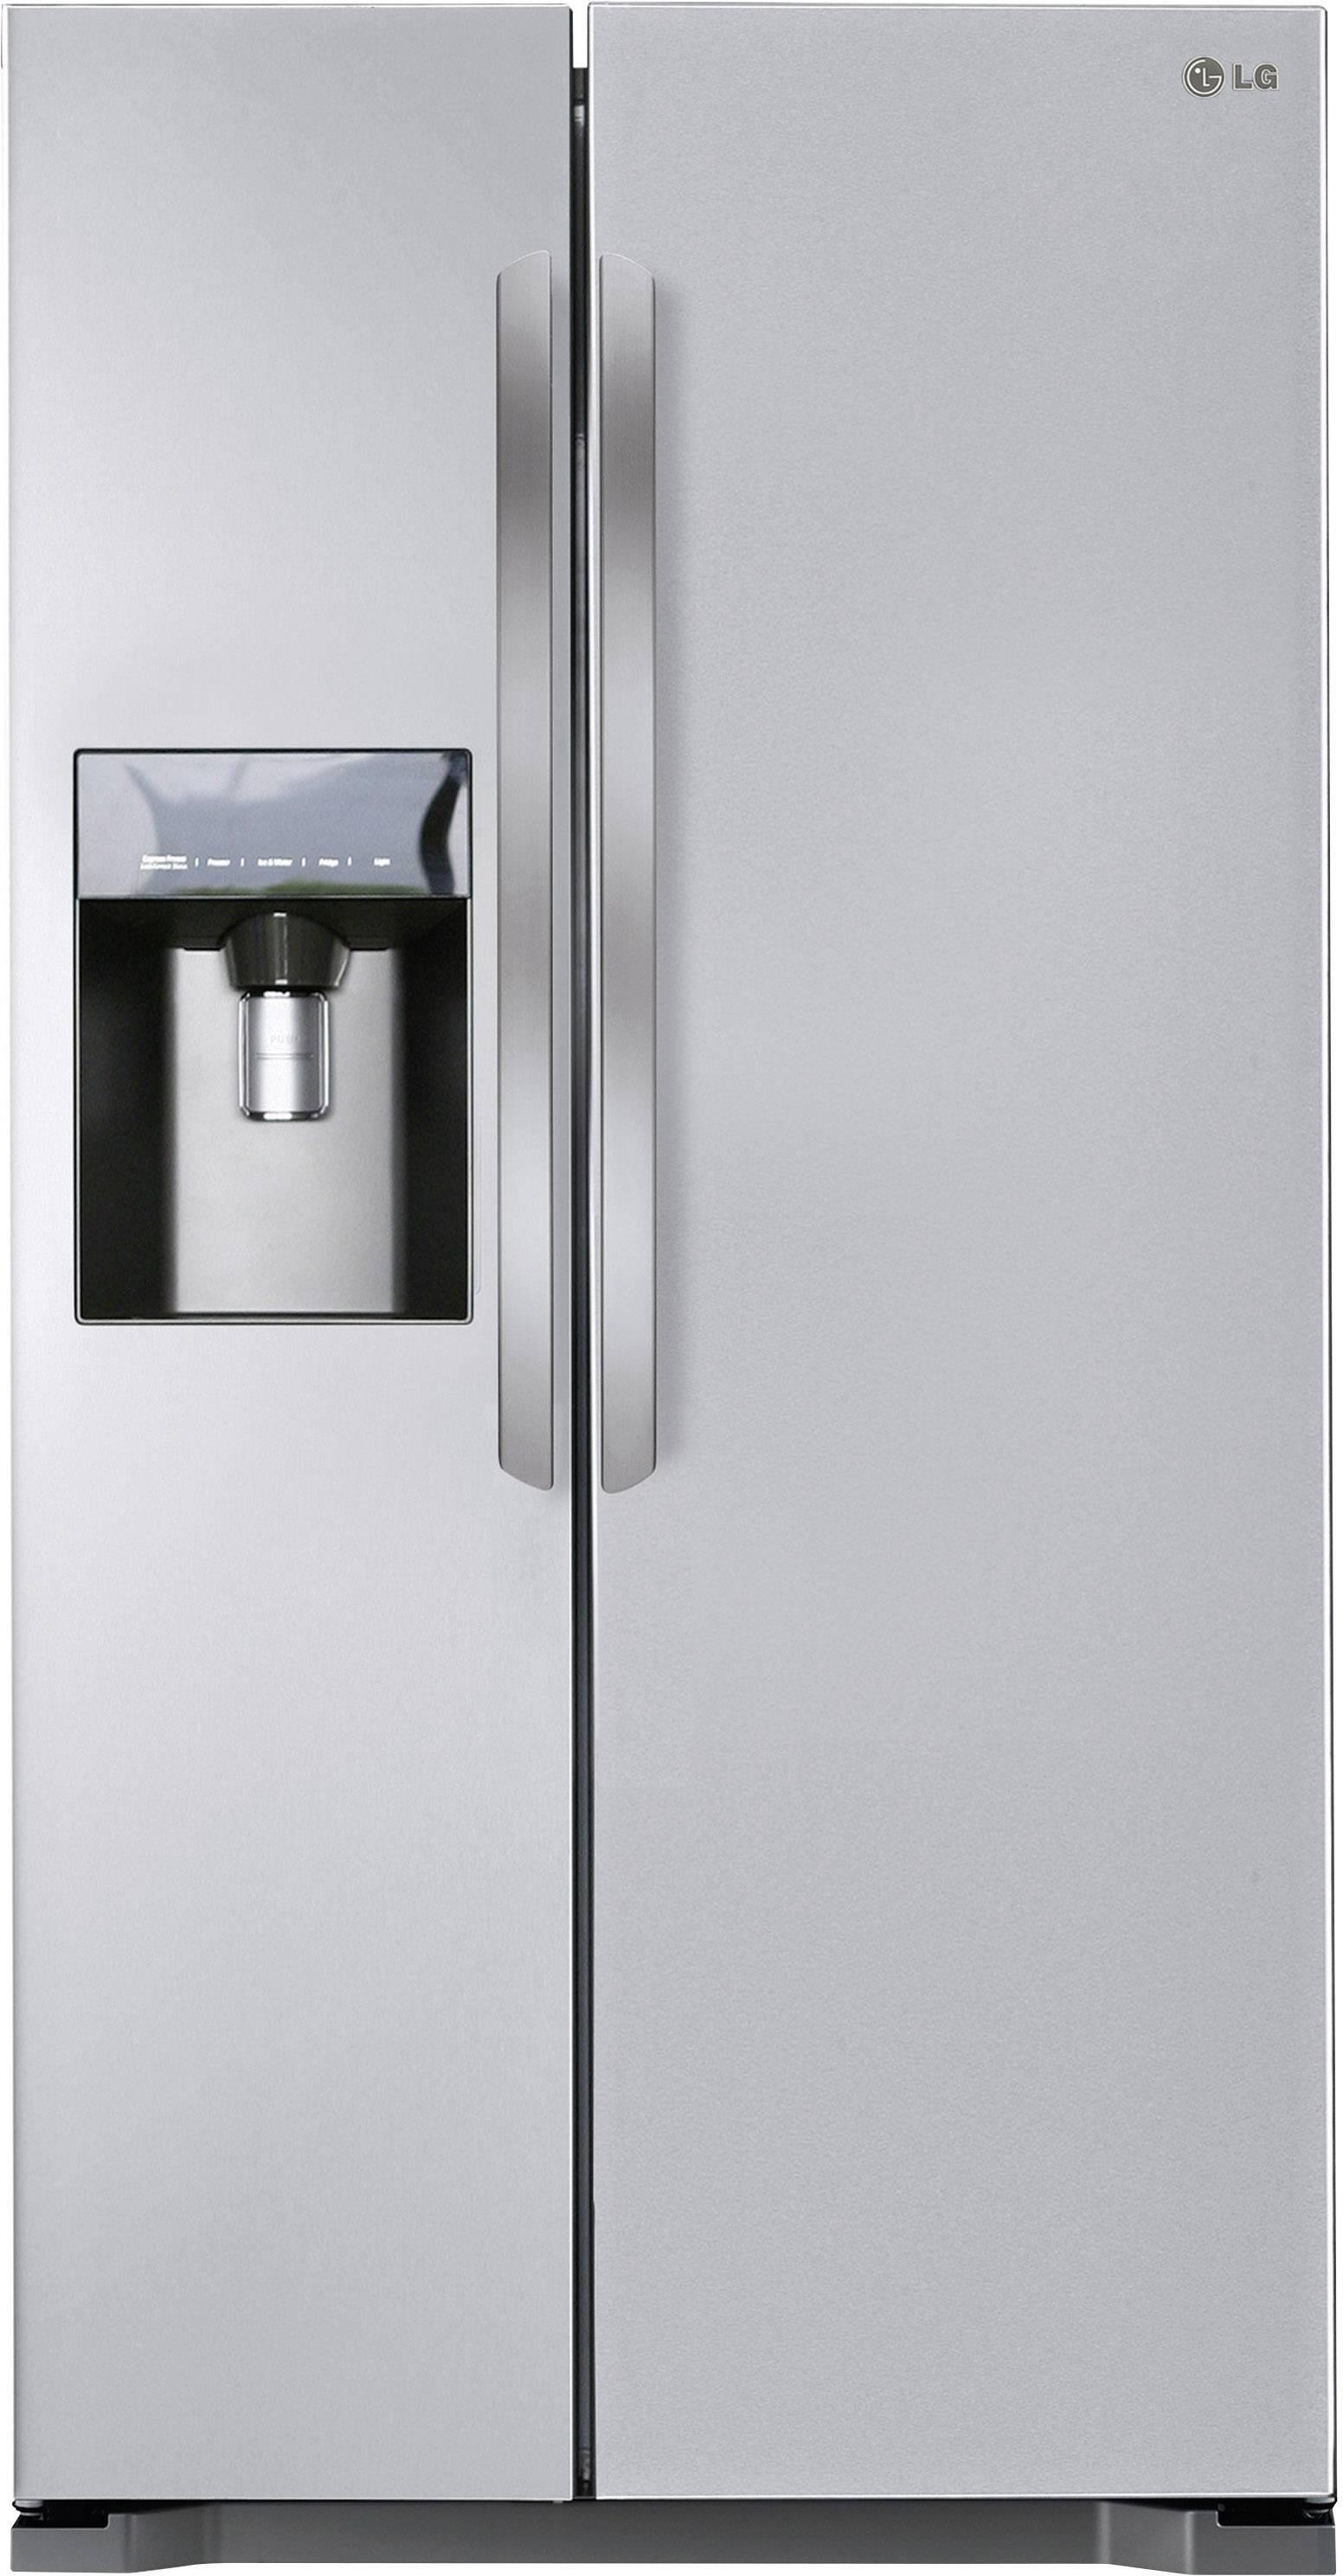 Großartig Side By Side Kühlschränke Fotos - Die Kinderzimmer Design ...